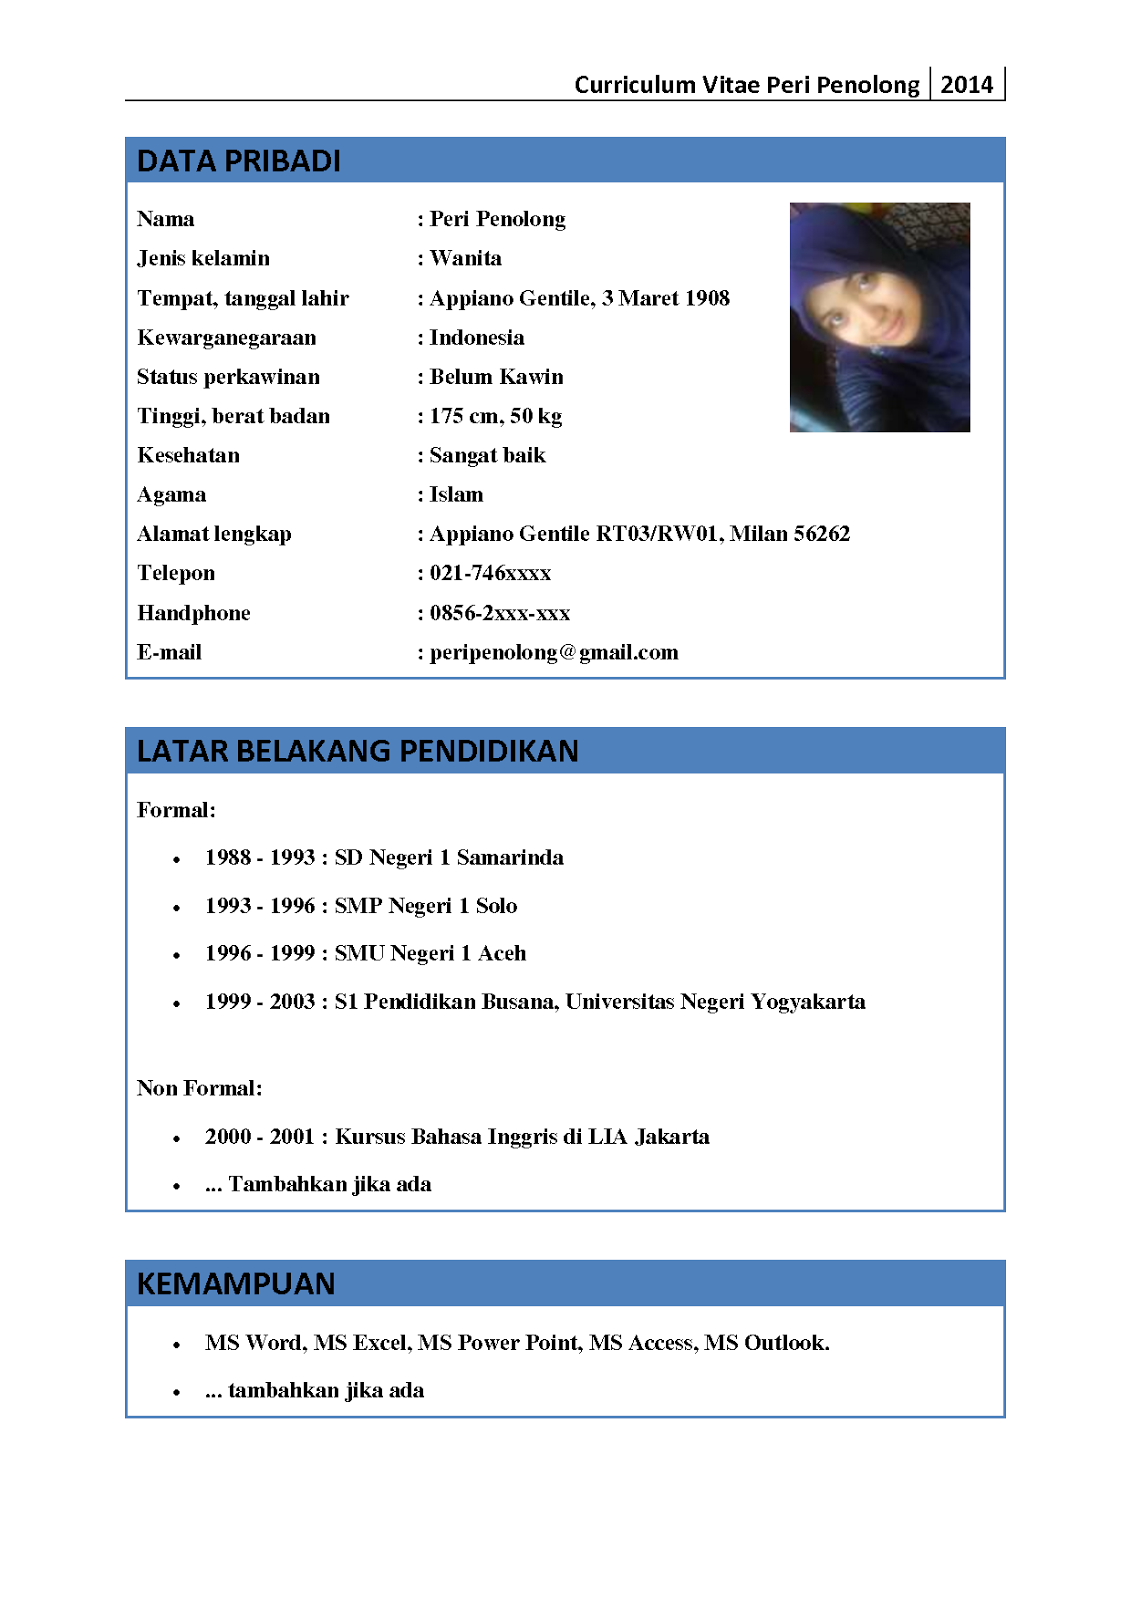 Contoh Cv Bahasa Indonesia - cv nabila